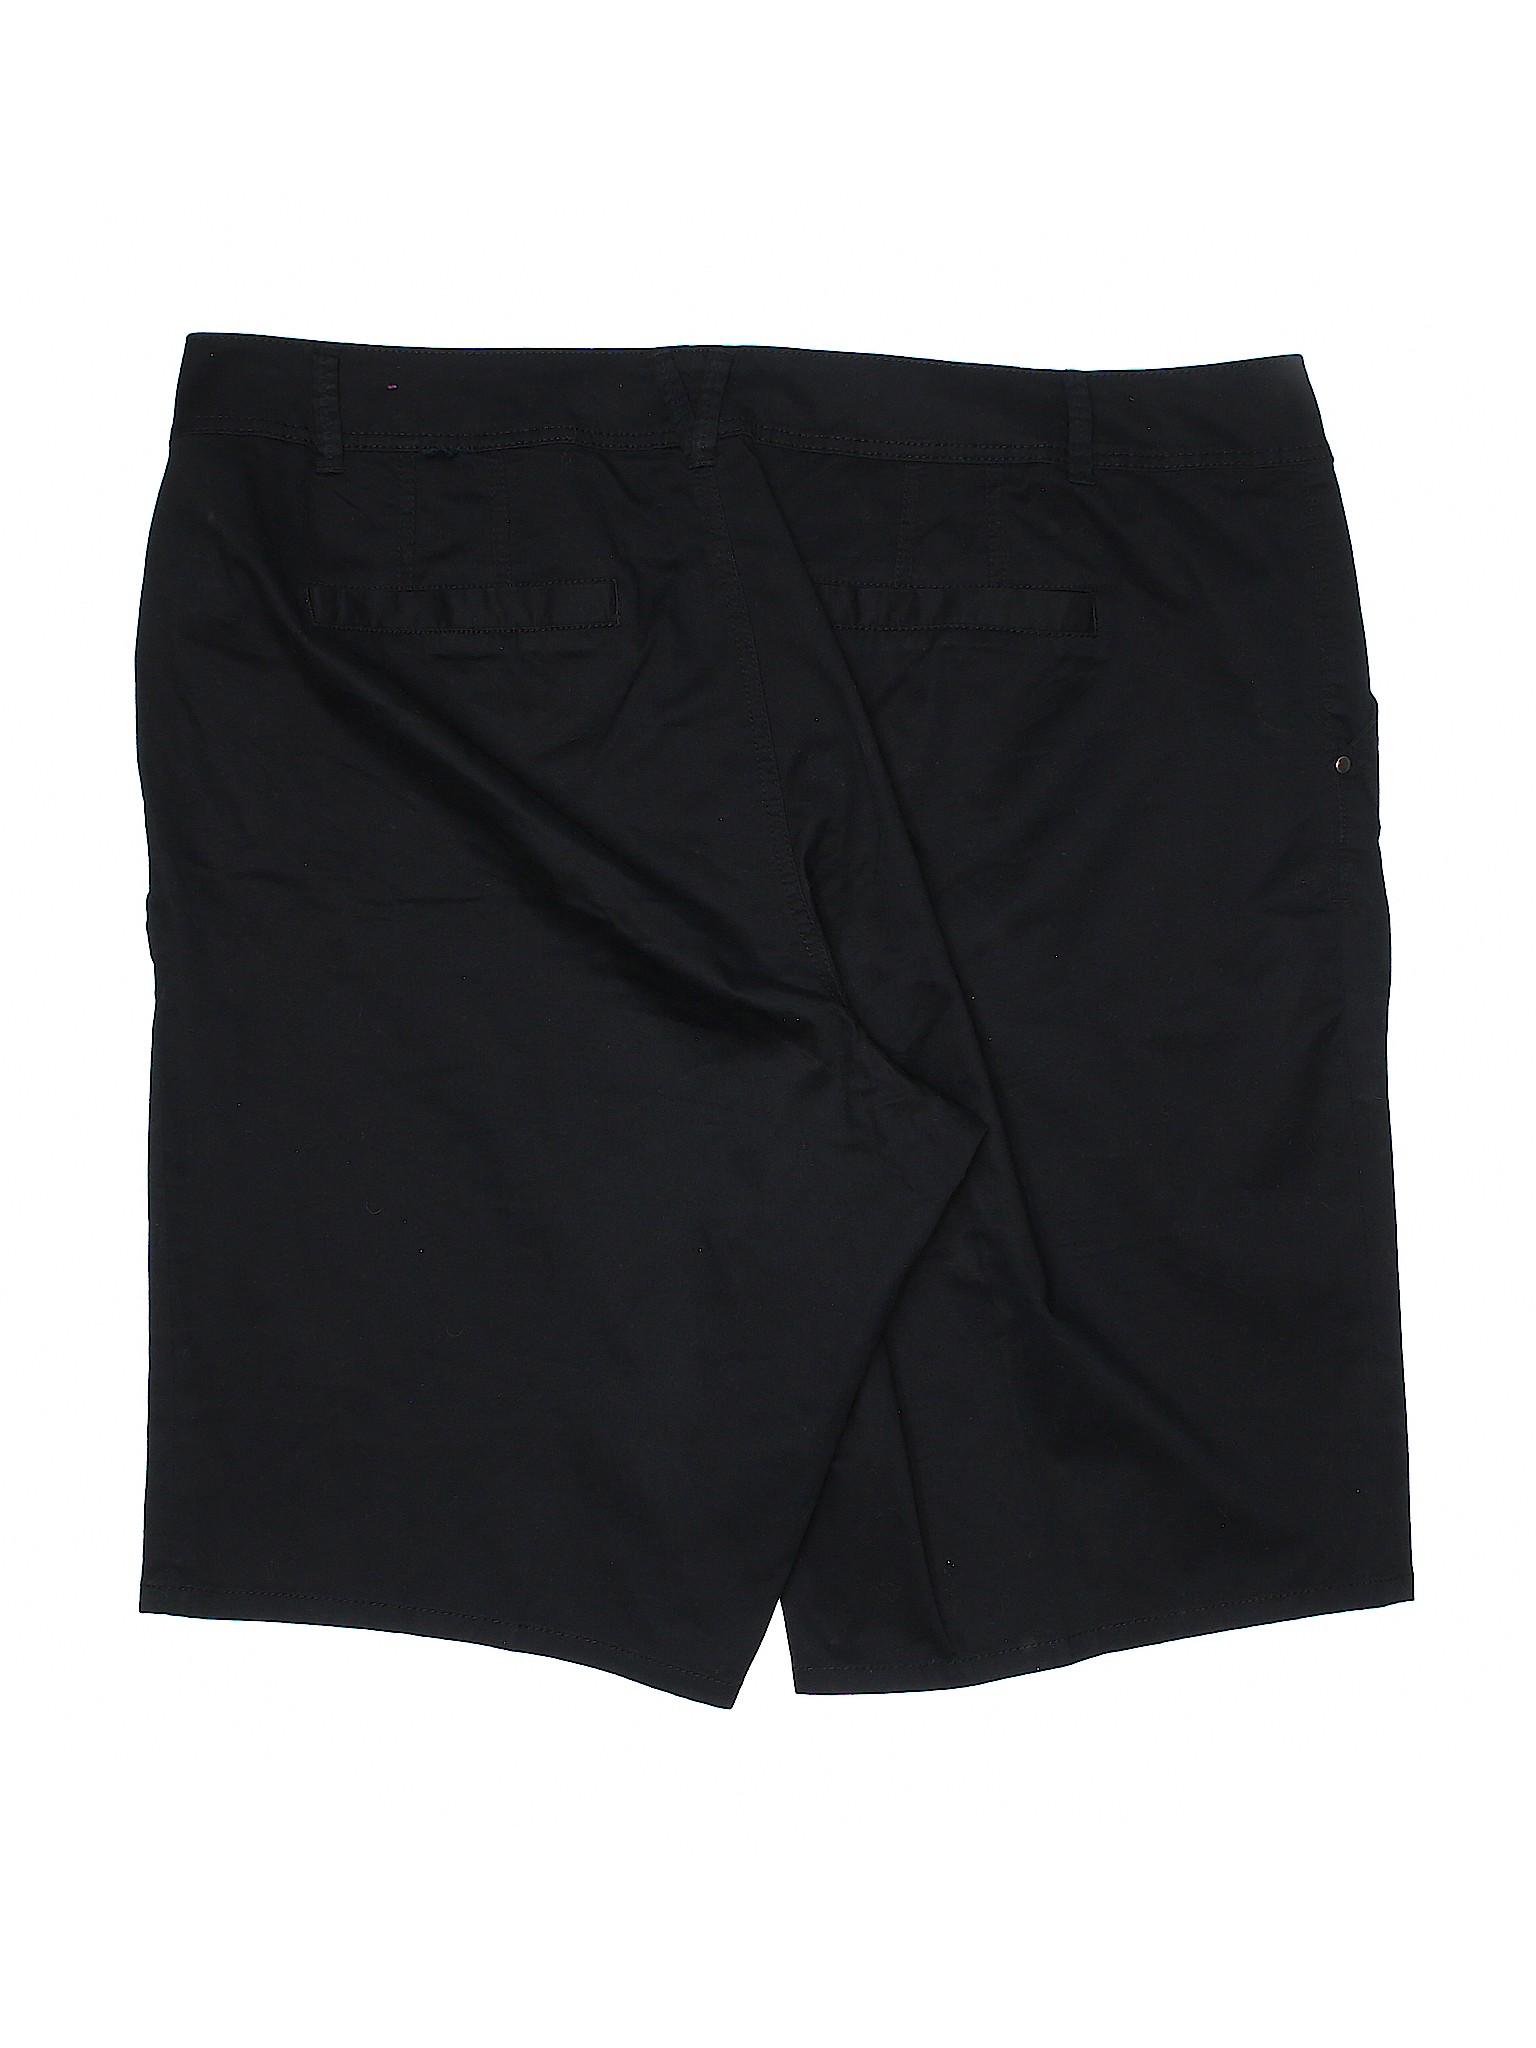 Boutique Shorts Khaki Lane Bryant leisure SUqSYxO